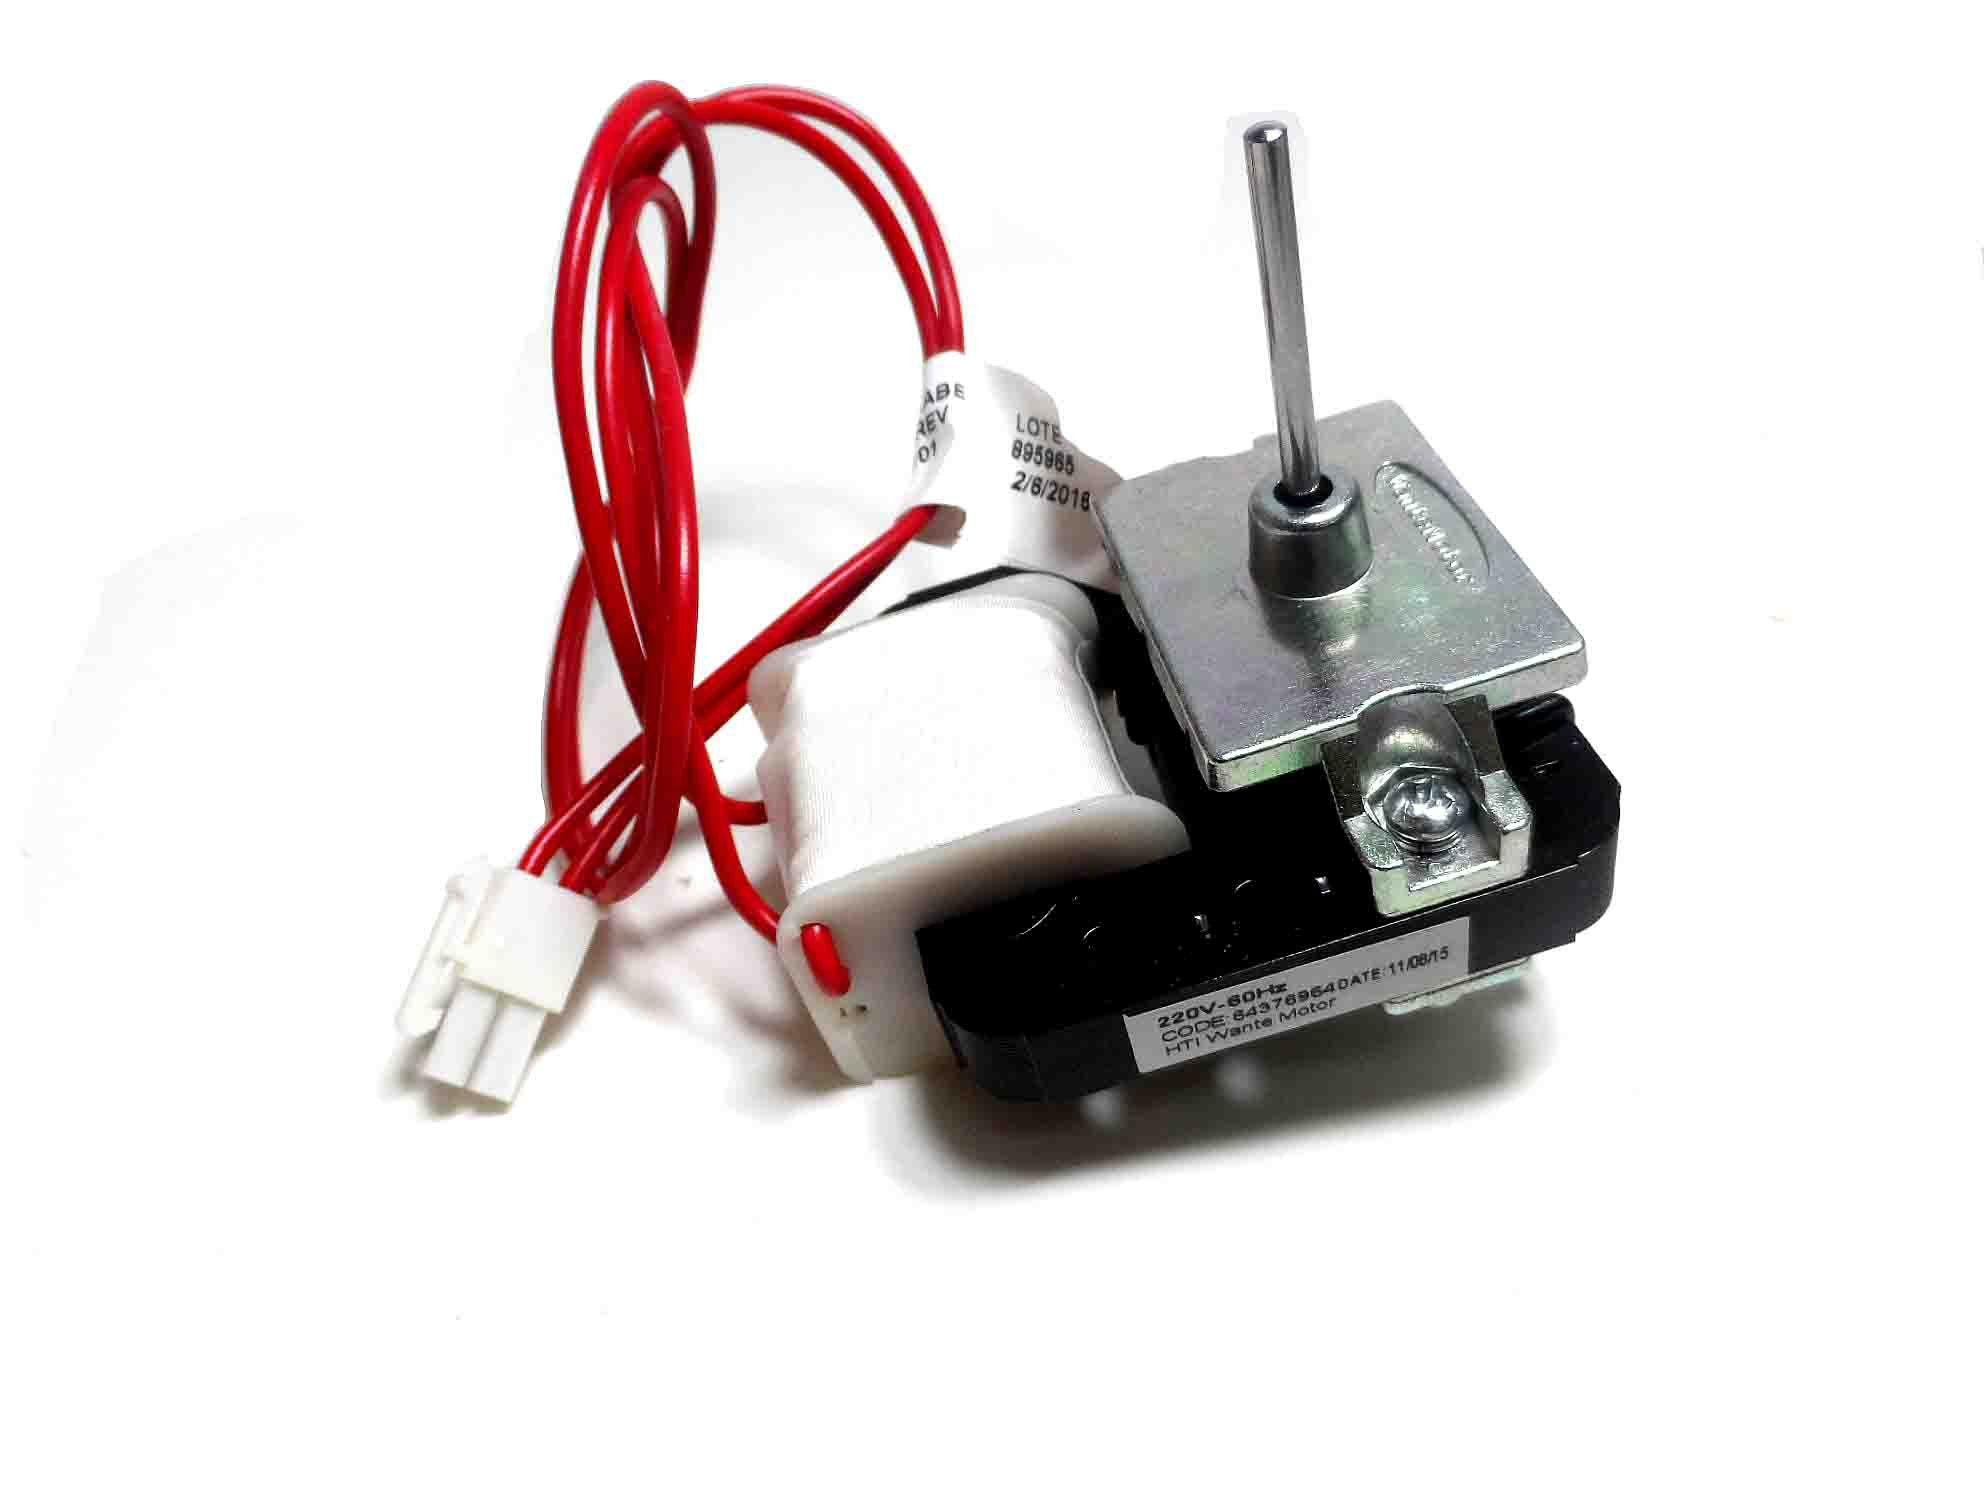 MOTOR VENTILADOR REFRIGERADOR ELECTROLUX 220V 64376967